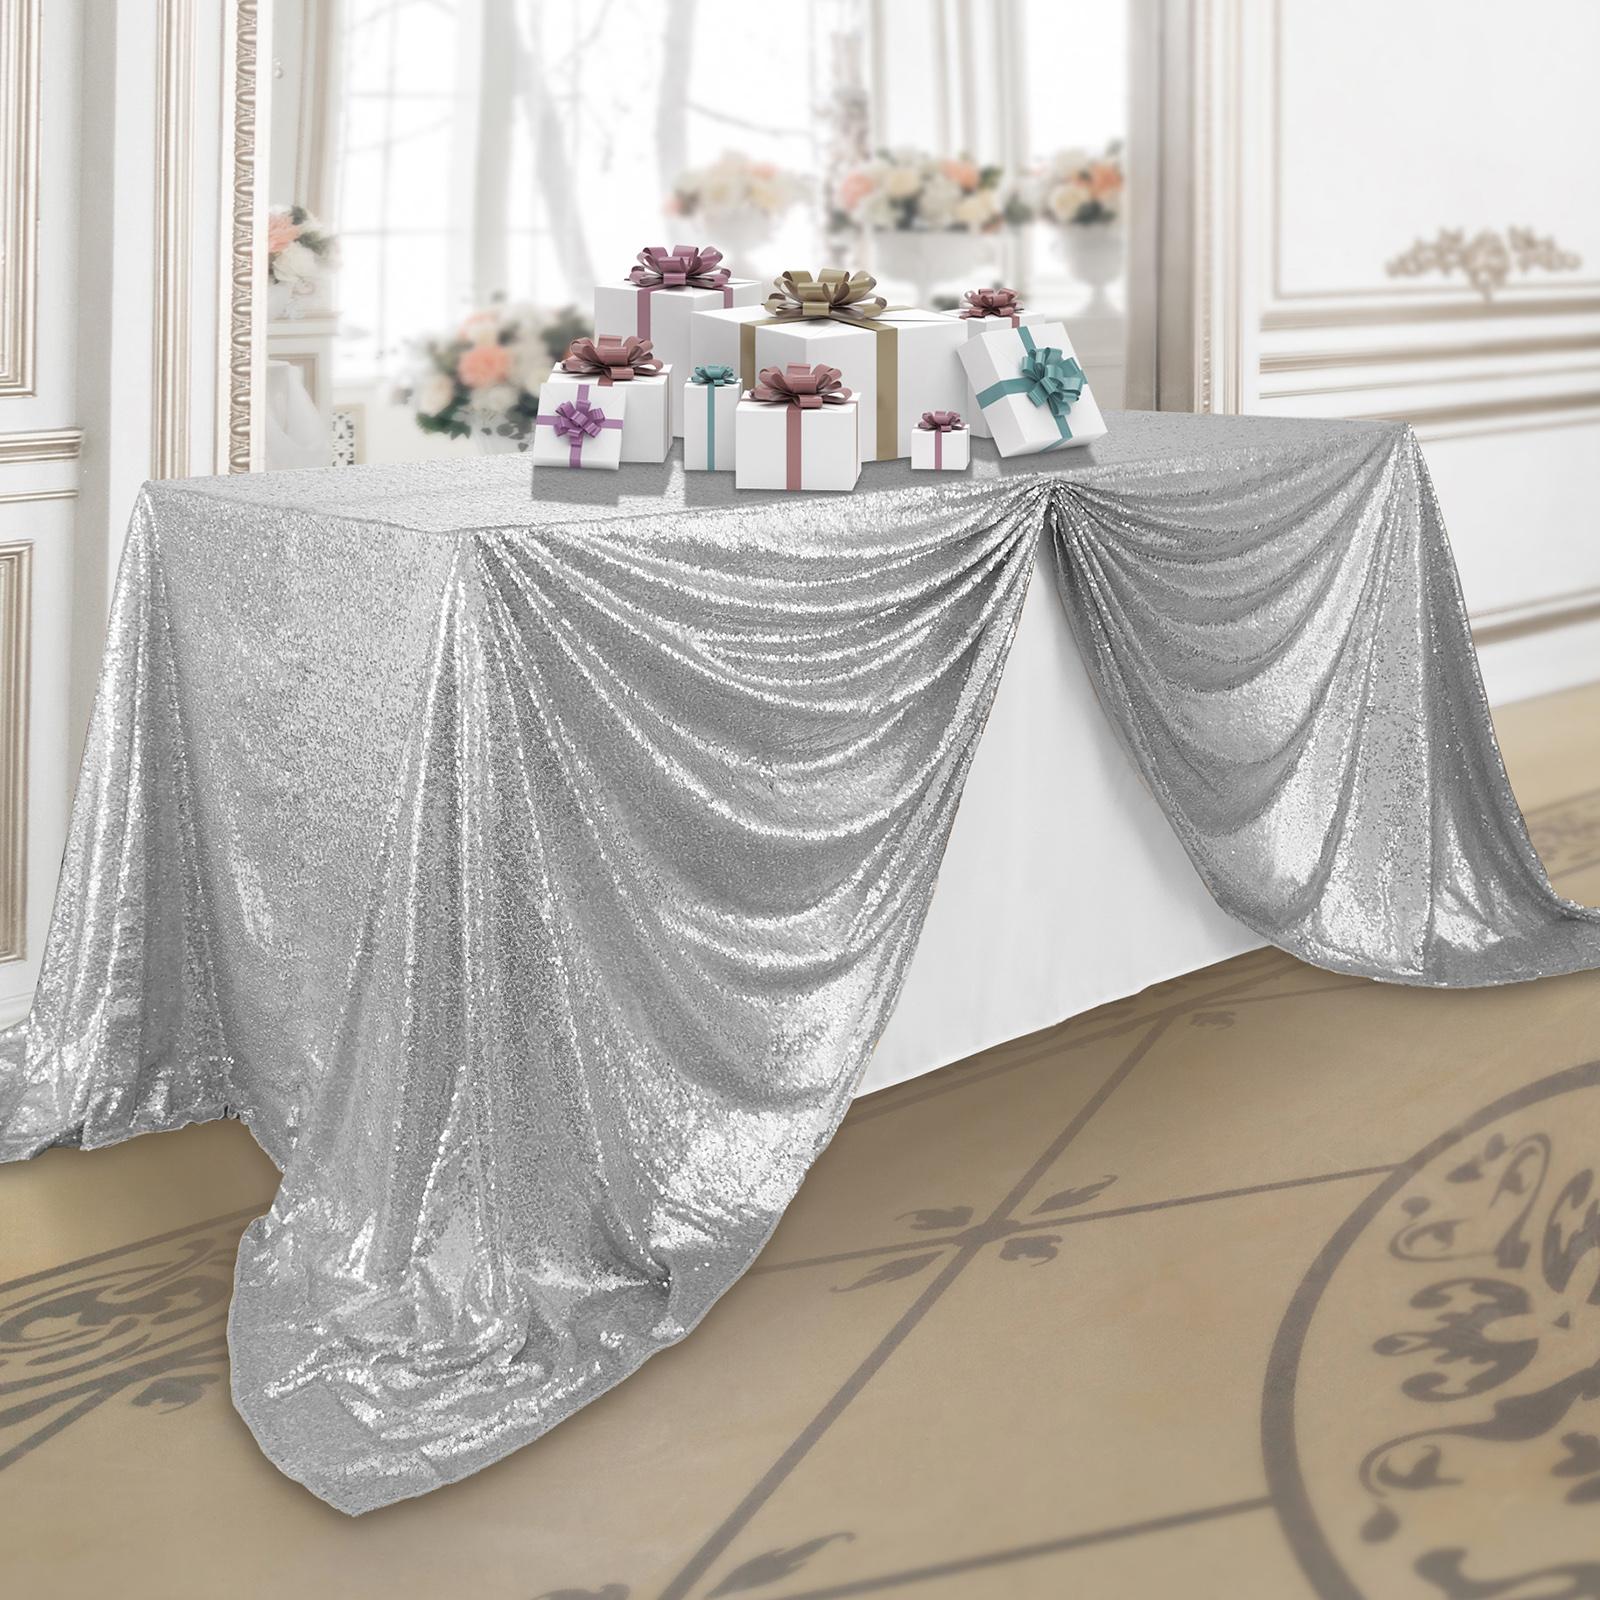 "Lann's Linens 90"" x 132"" Silver Sequin Tablecloth, Sparkly ..."